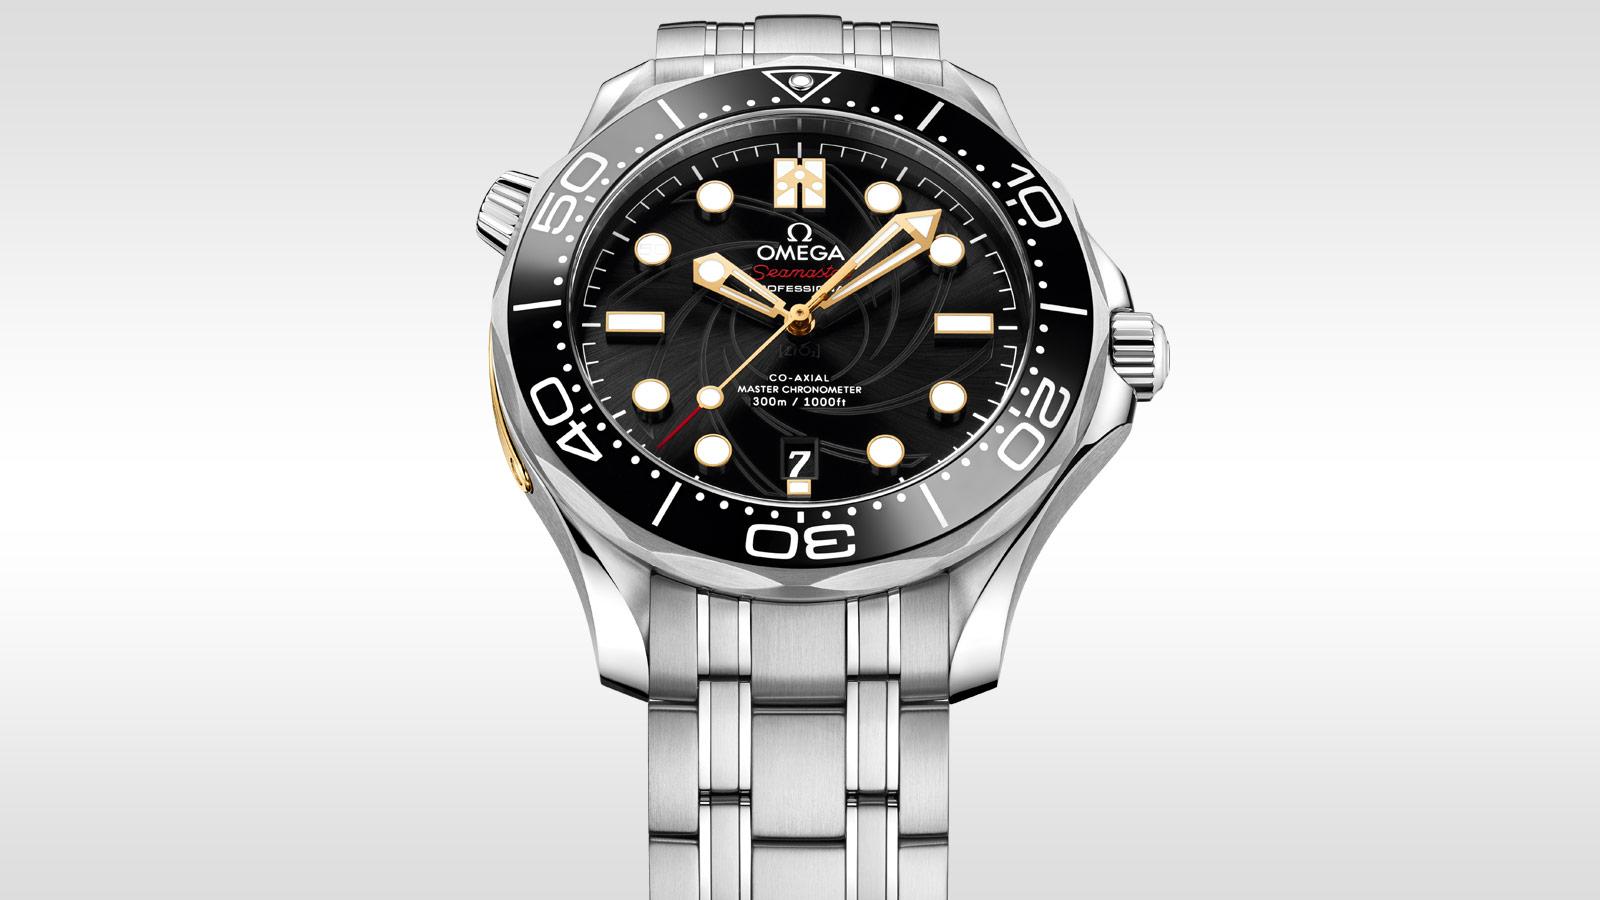 Seamaster 300米潜水表 300米潜水表 欧米茄至臻天文台表42毫米 - 210.22.42.20.01.004 - 查看 6